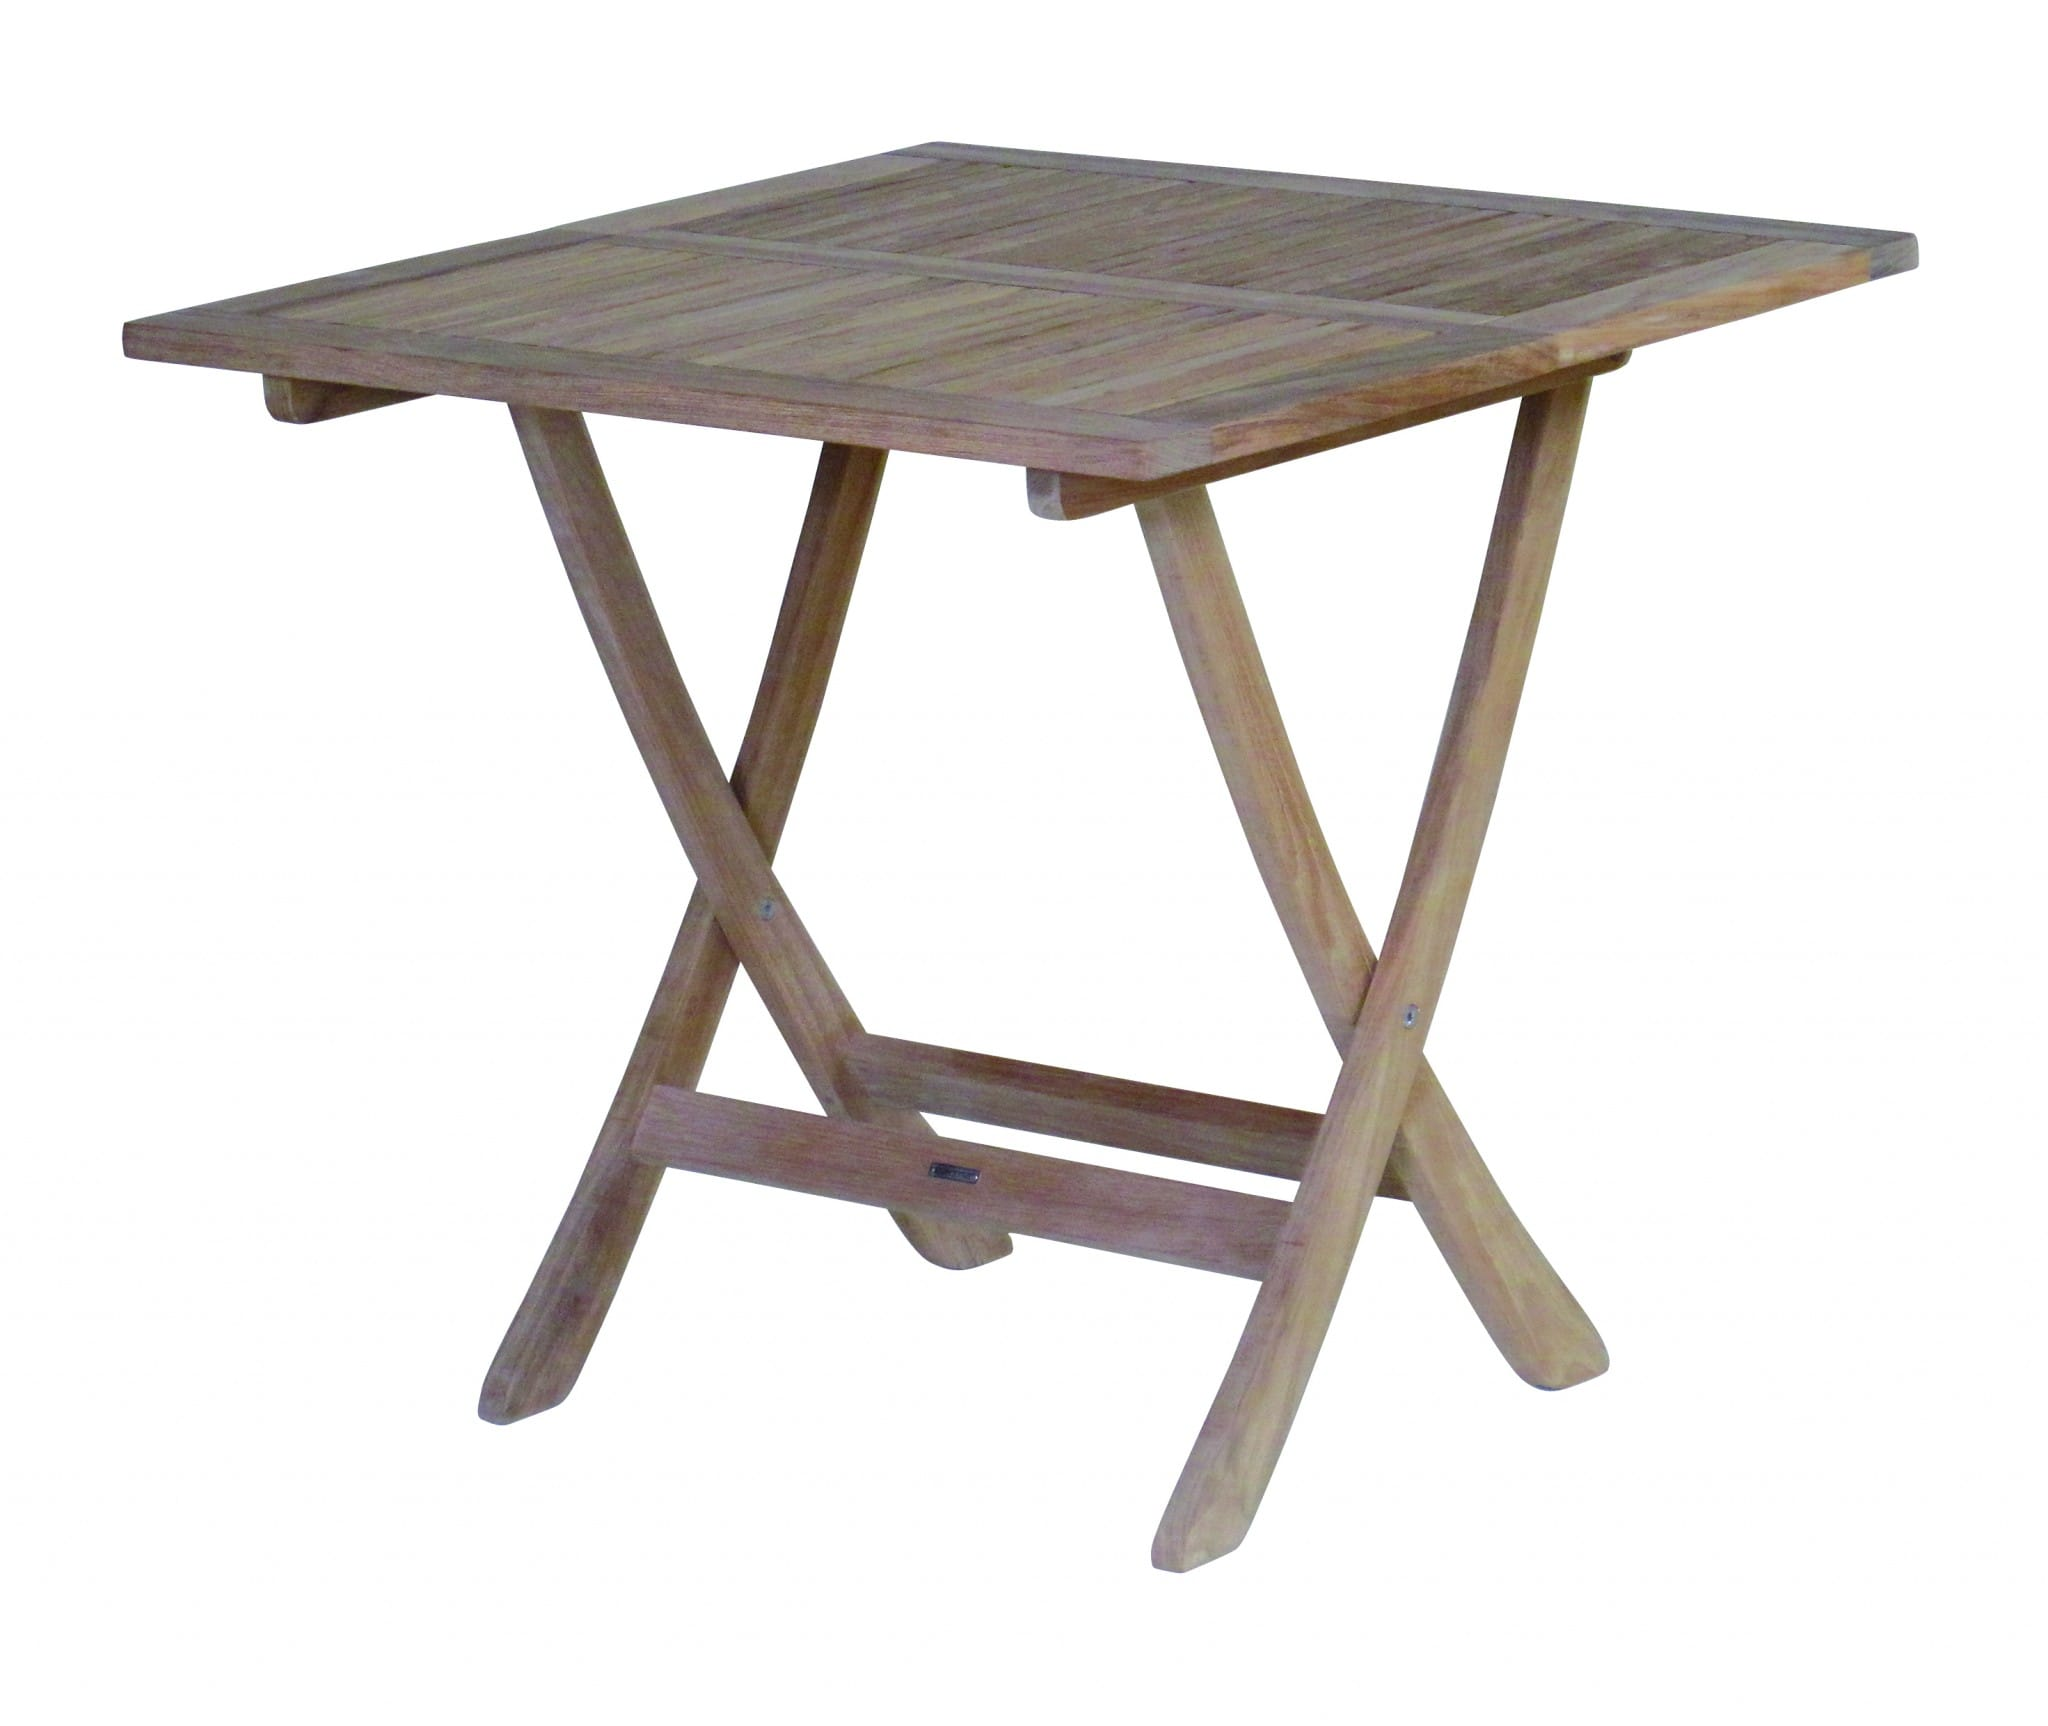 carma teak klapptisch verona quadratisch rechteckig oder rund premium teakholz bumb. Black Bedroom Furniture Sets. Home Design Ideas